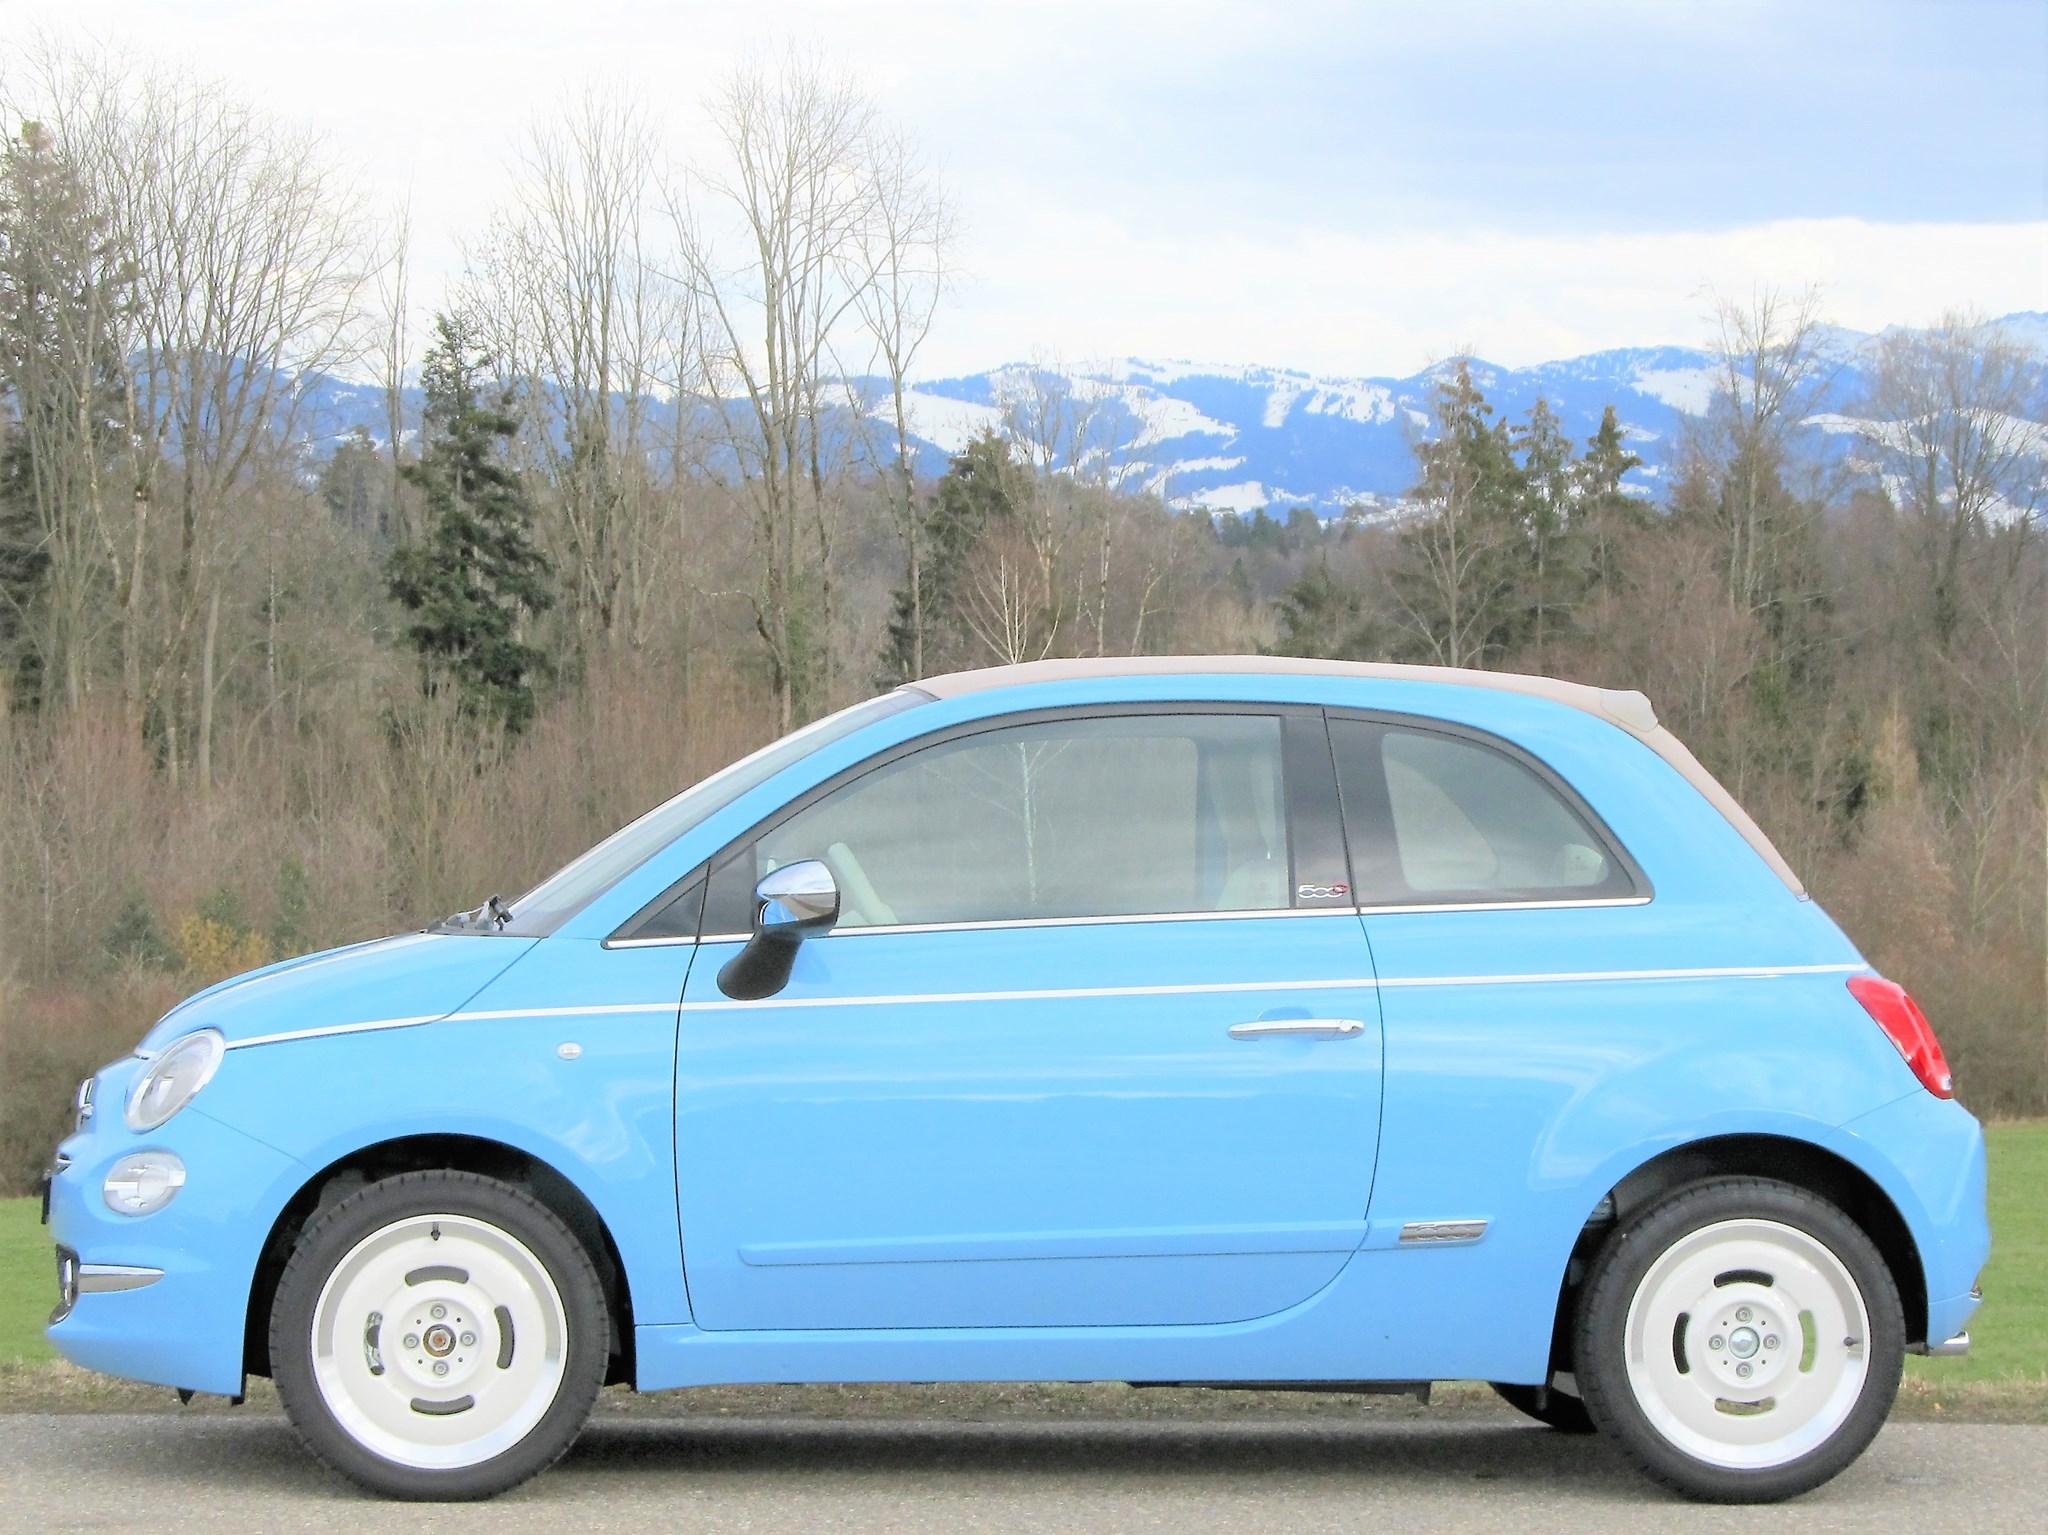 cabriolet Fiat 500 C 0.9 Twinair Turbo Spiaggina 58